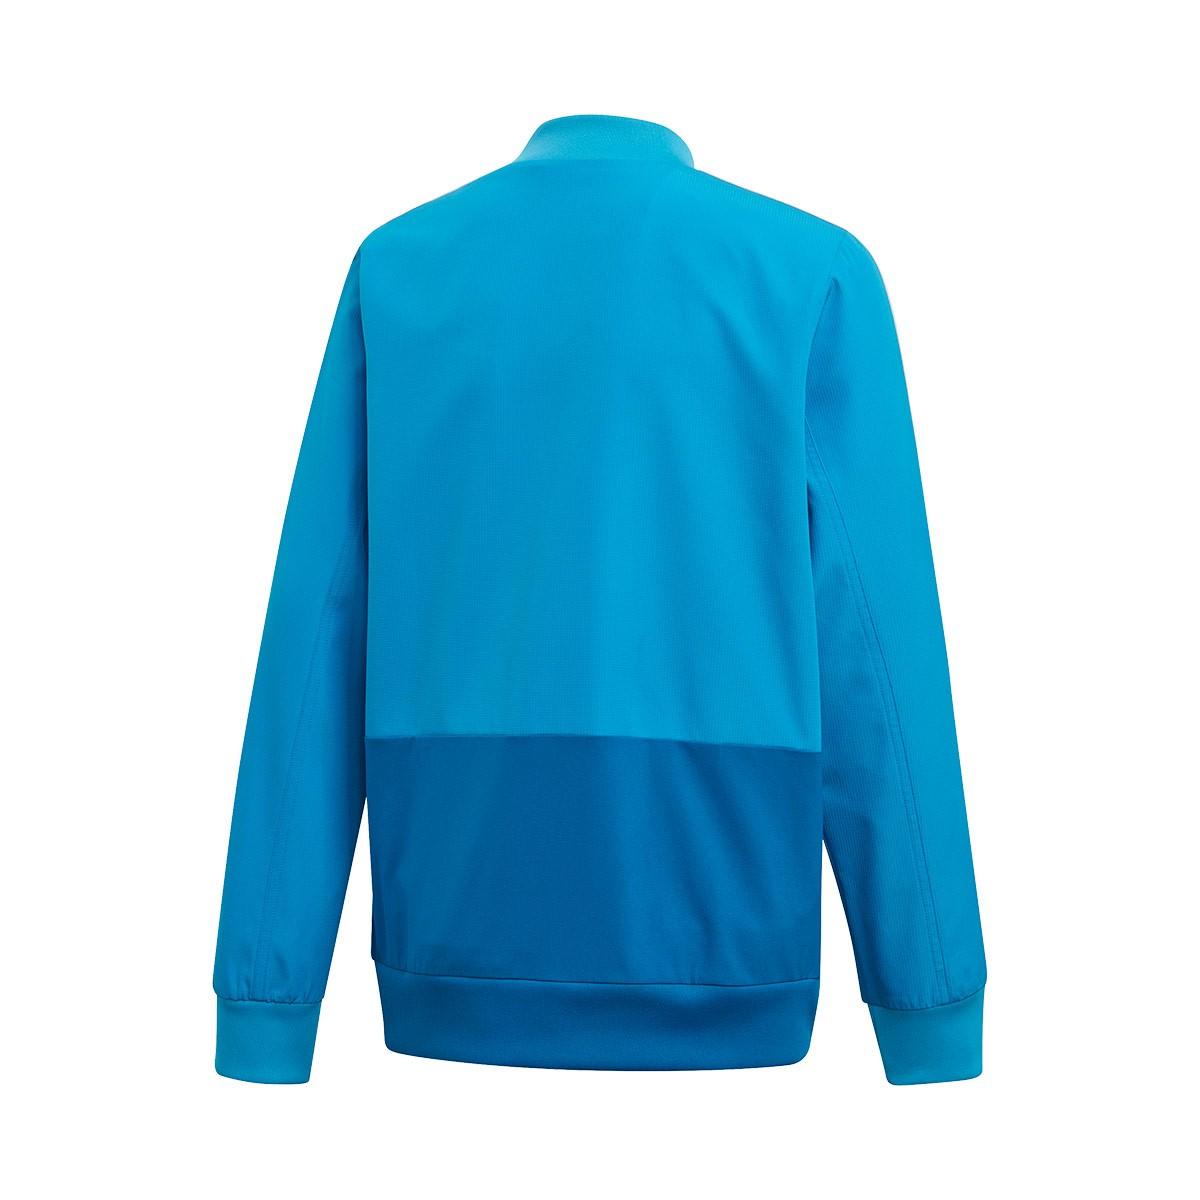 e3148344 Jacket adidas Kids Real Madrid Prematch 2018-2019 Craft blue-Dark ...